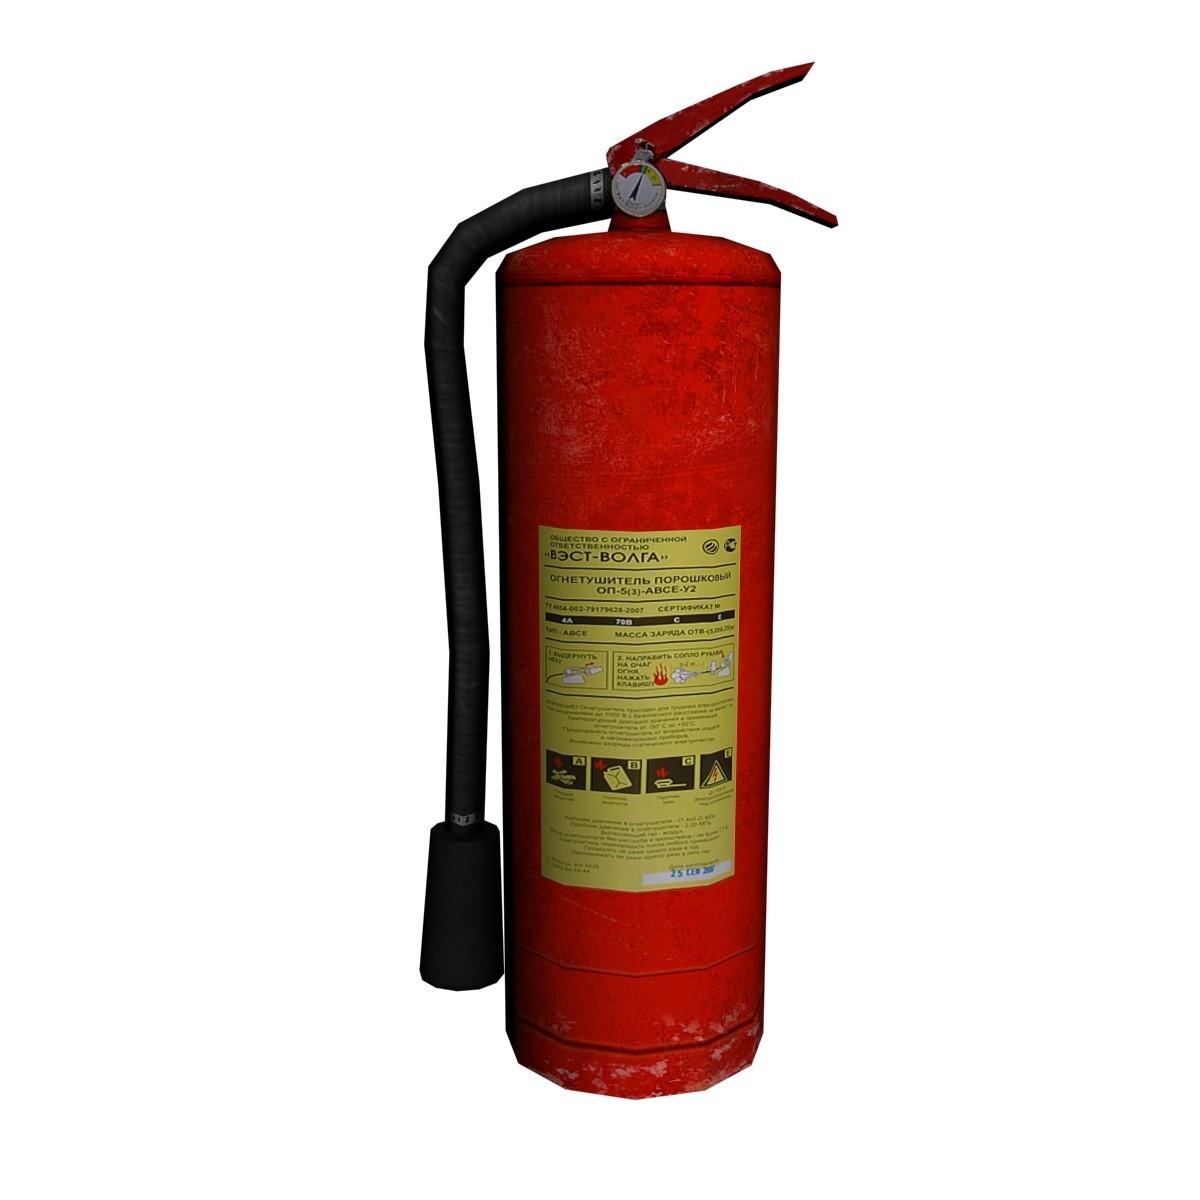 Turn_Fire_extinguisher_0000.jpg